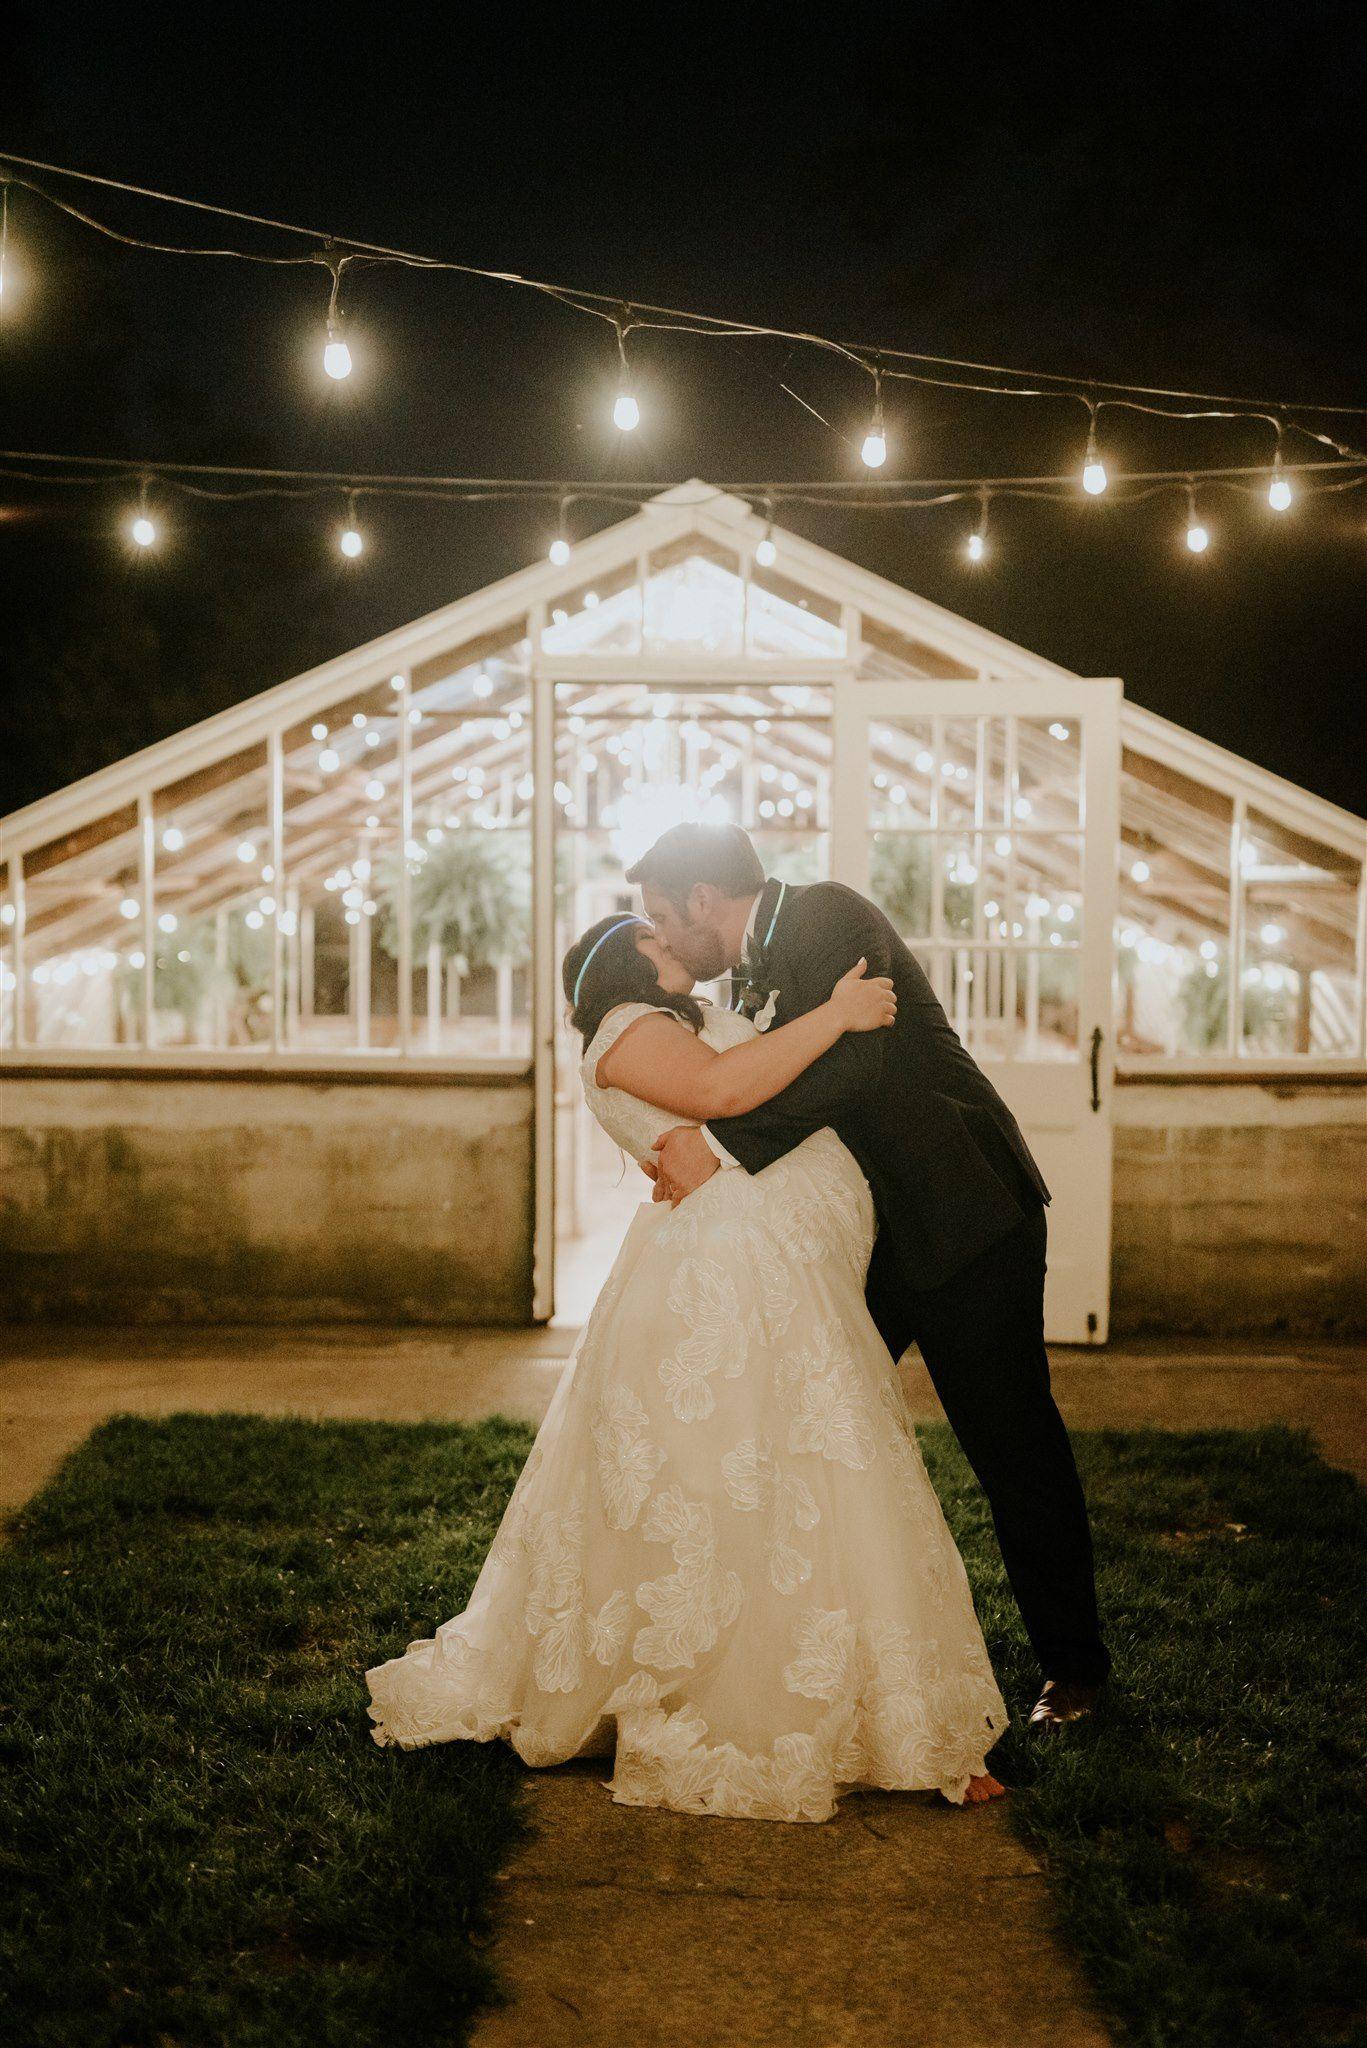 greenhouse wedding venue in 2020 Greenhouse wedding